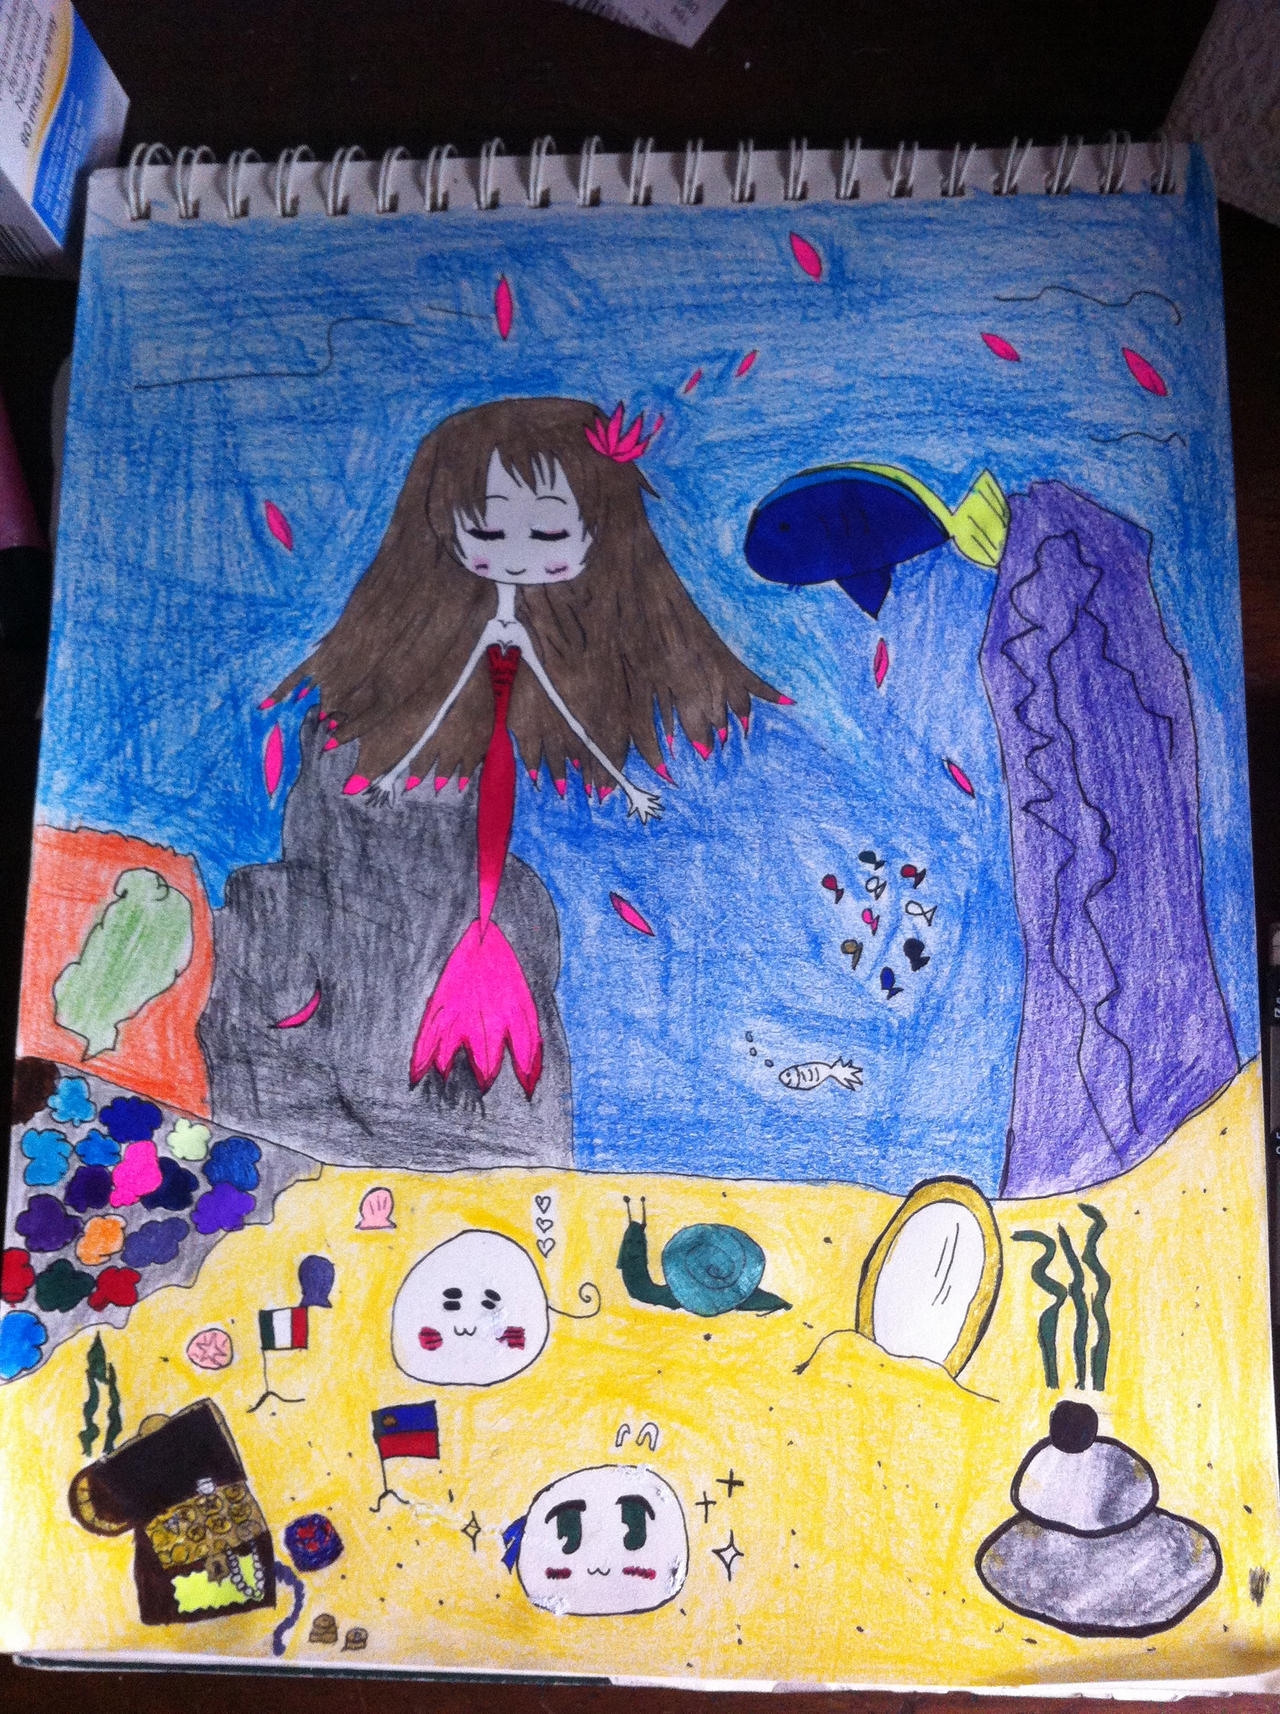 My home under the sea by Whitelili123 by Whitelili123